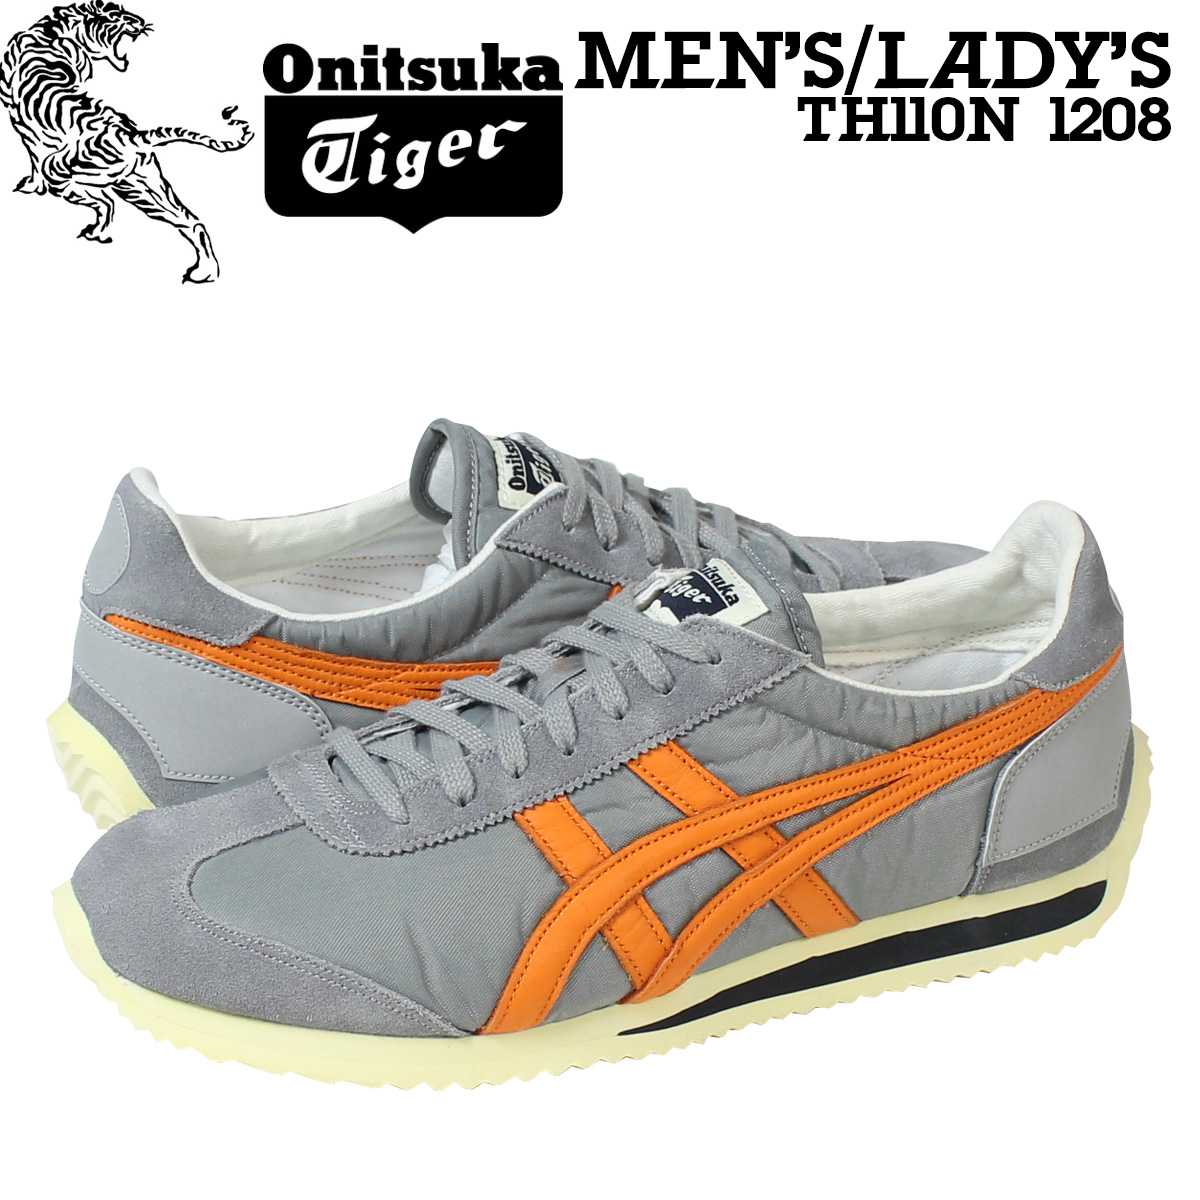 super popular 2bdc1 83555 Onitsuka tiger Onitsuka Tiger California sneakers CALIFORNIA 78 VIN  TH110N-1208 men gap Dis gray